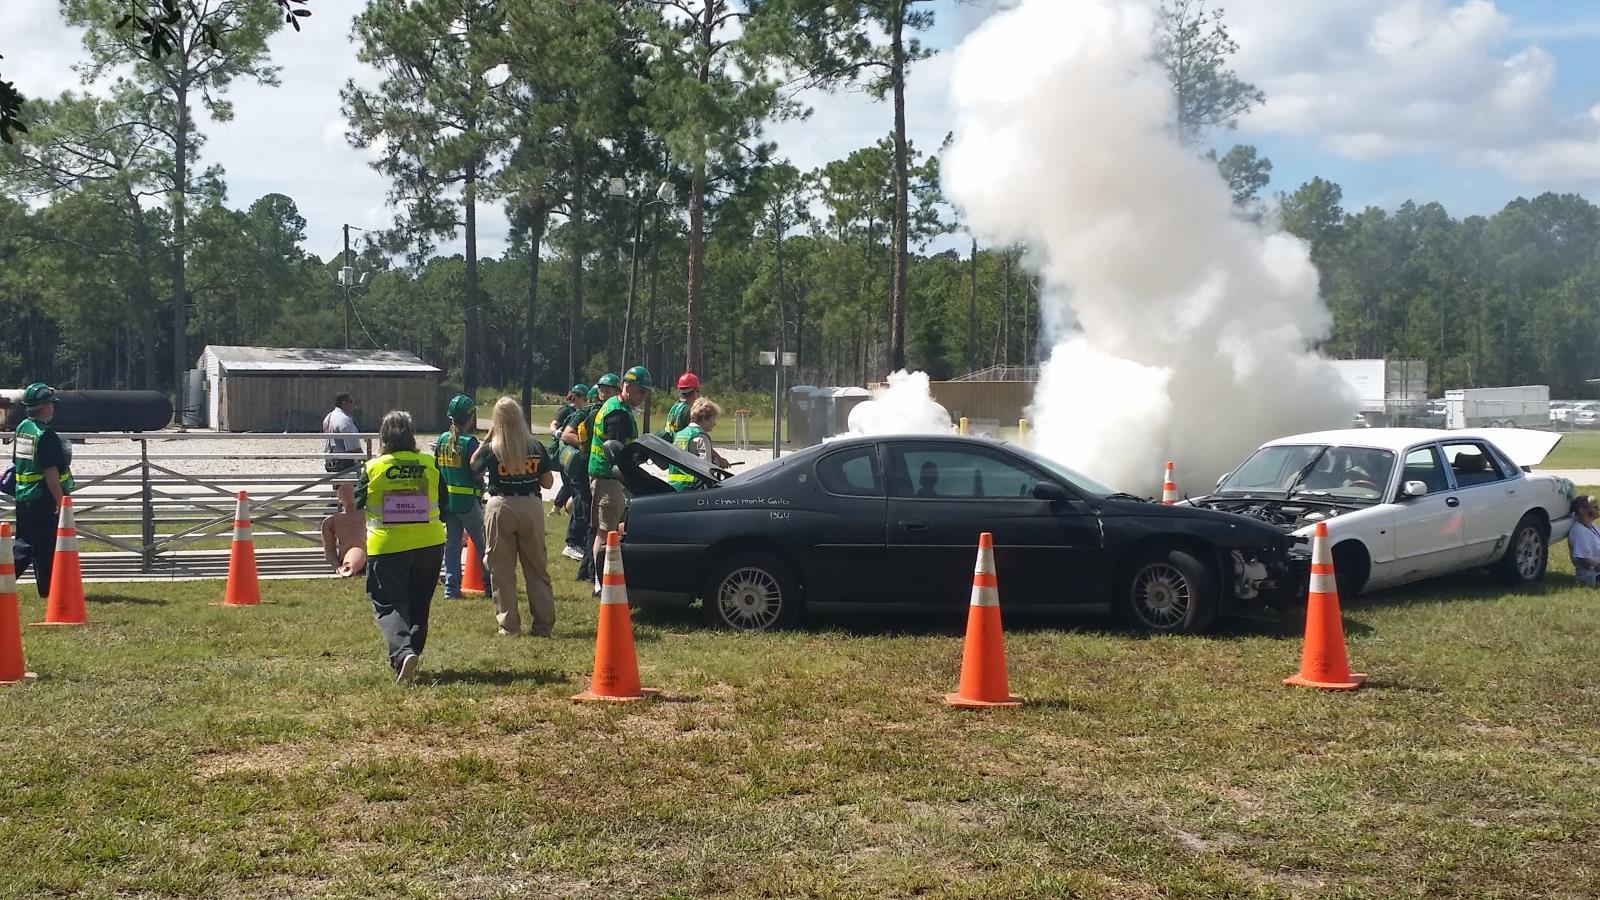 City of Fort Lauderdale, FL : Community Emergency Response